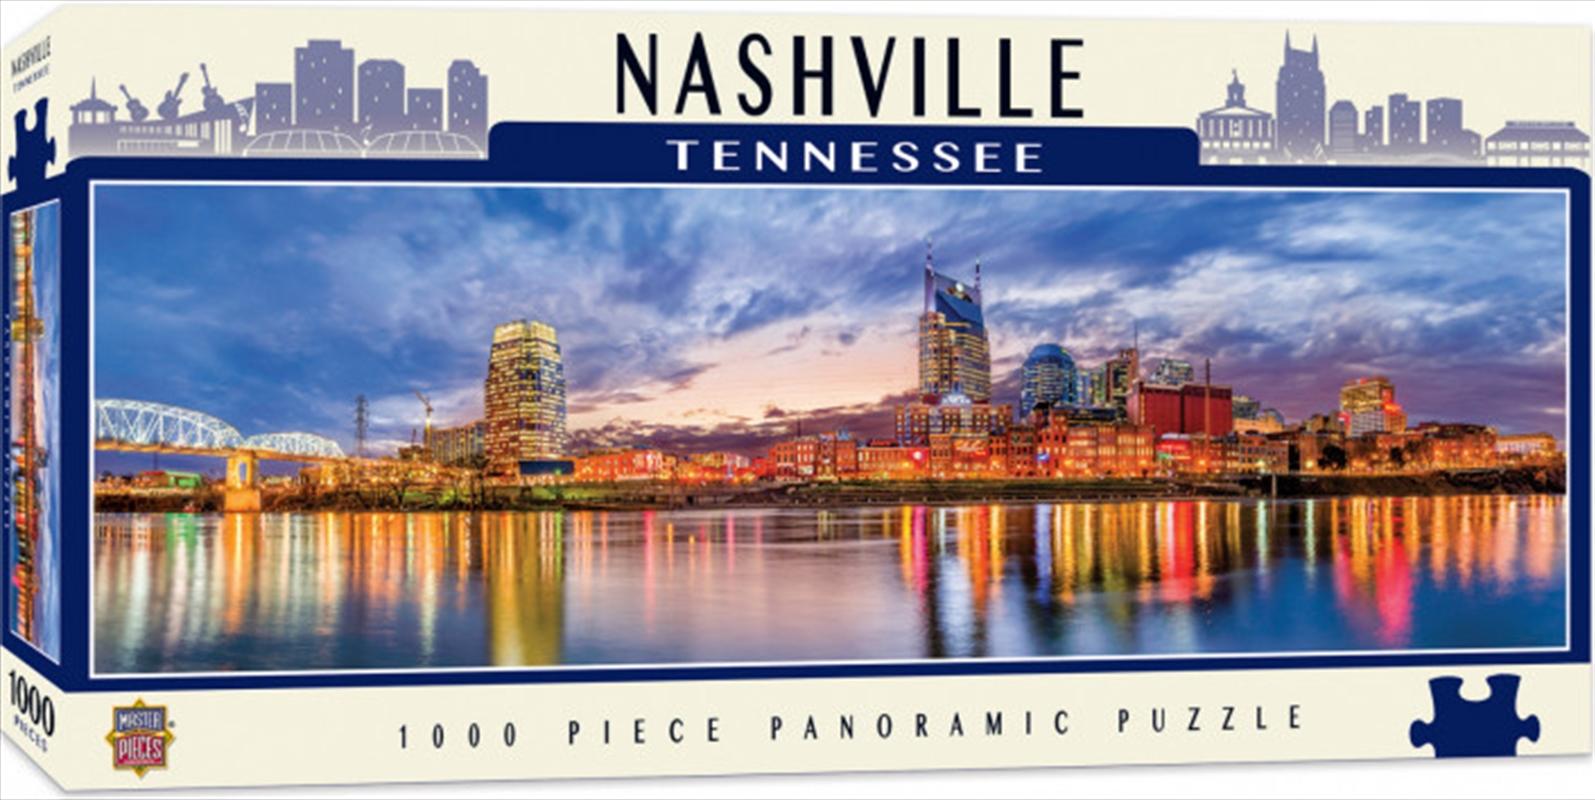 Panoramic Nashville Tennessee 1000 Piece Puzzle | Merchandise